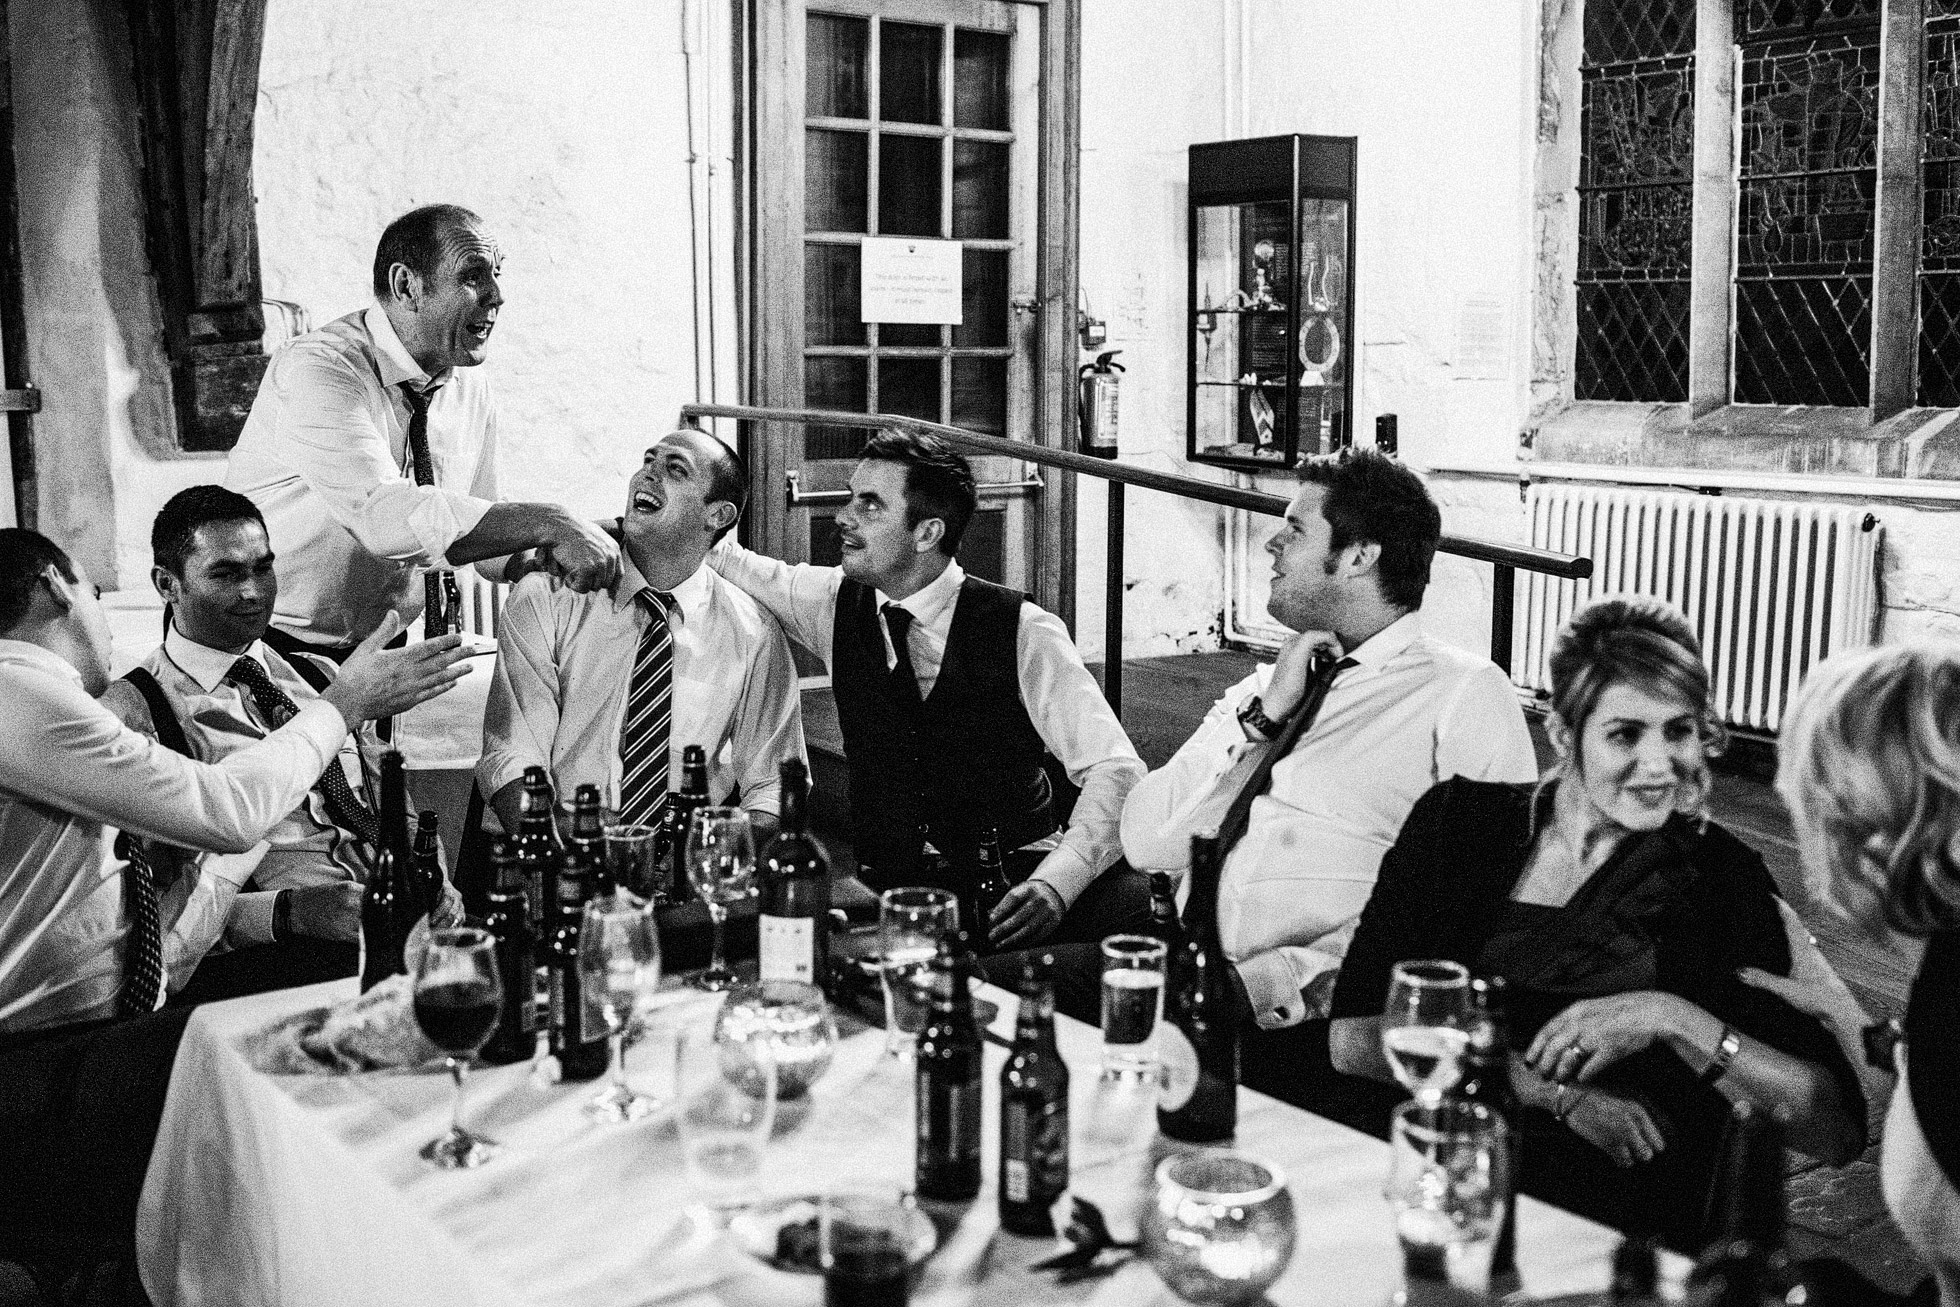 Merchant Adventurers Hall Evening Wedding Reception